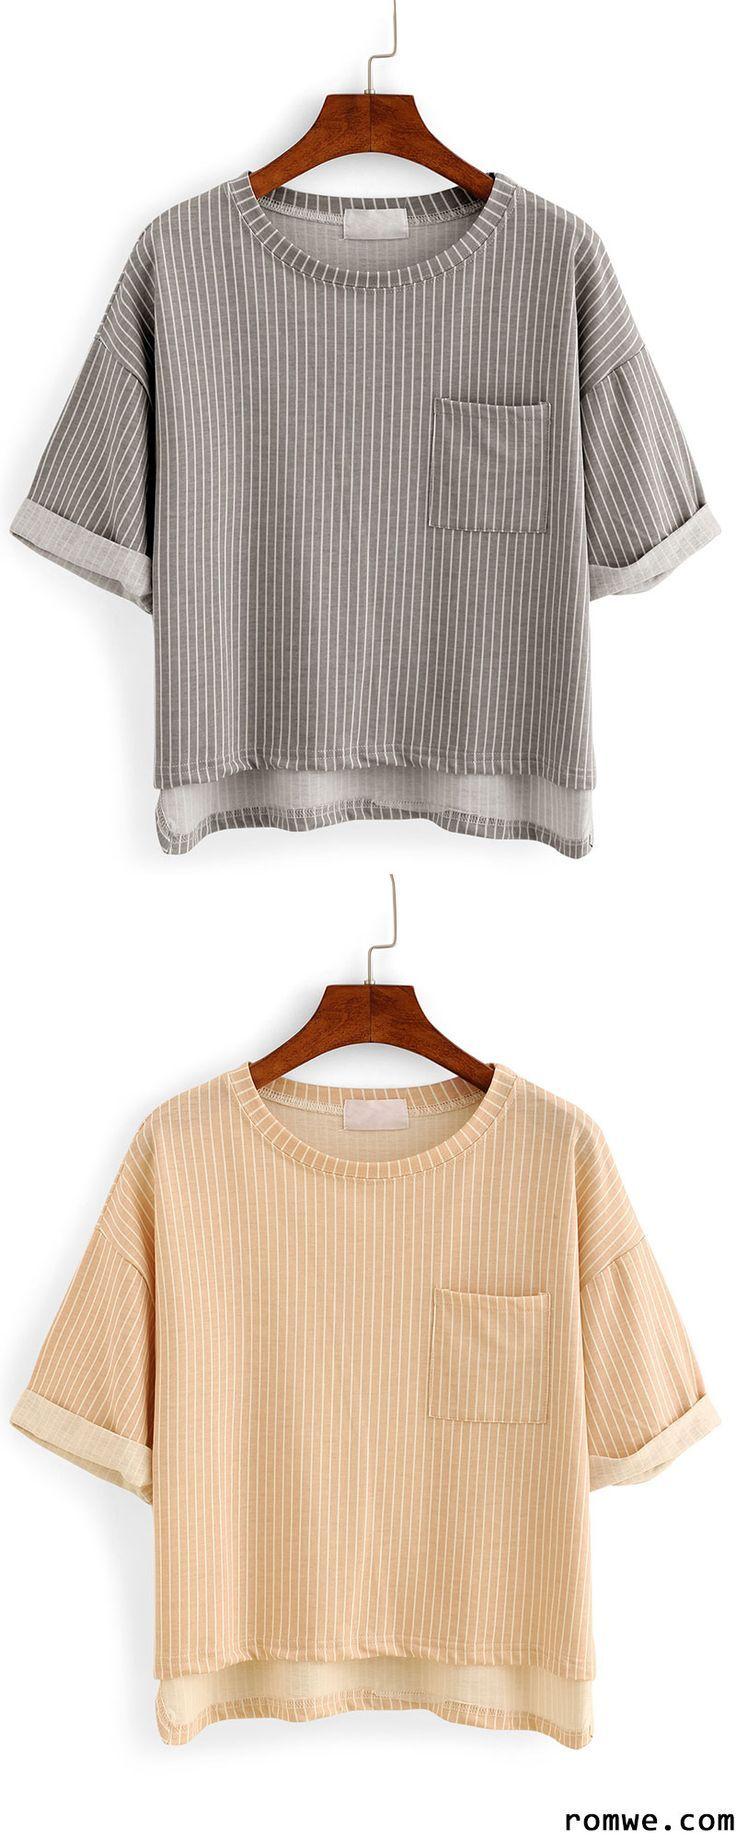 Vertical Striped High-Low Pocket T-shirt - Grey & Khaki